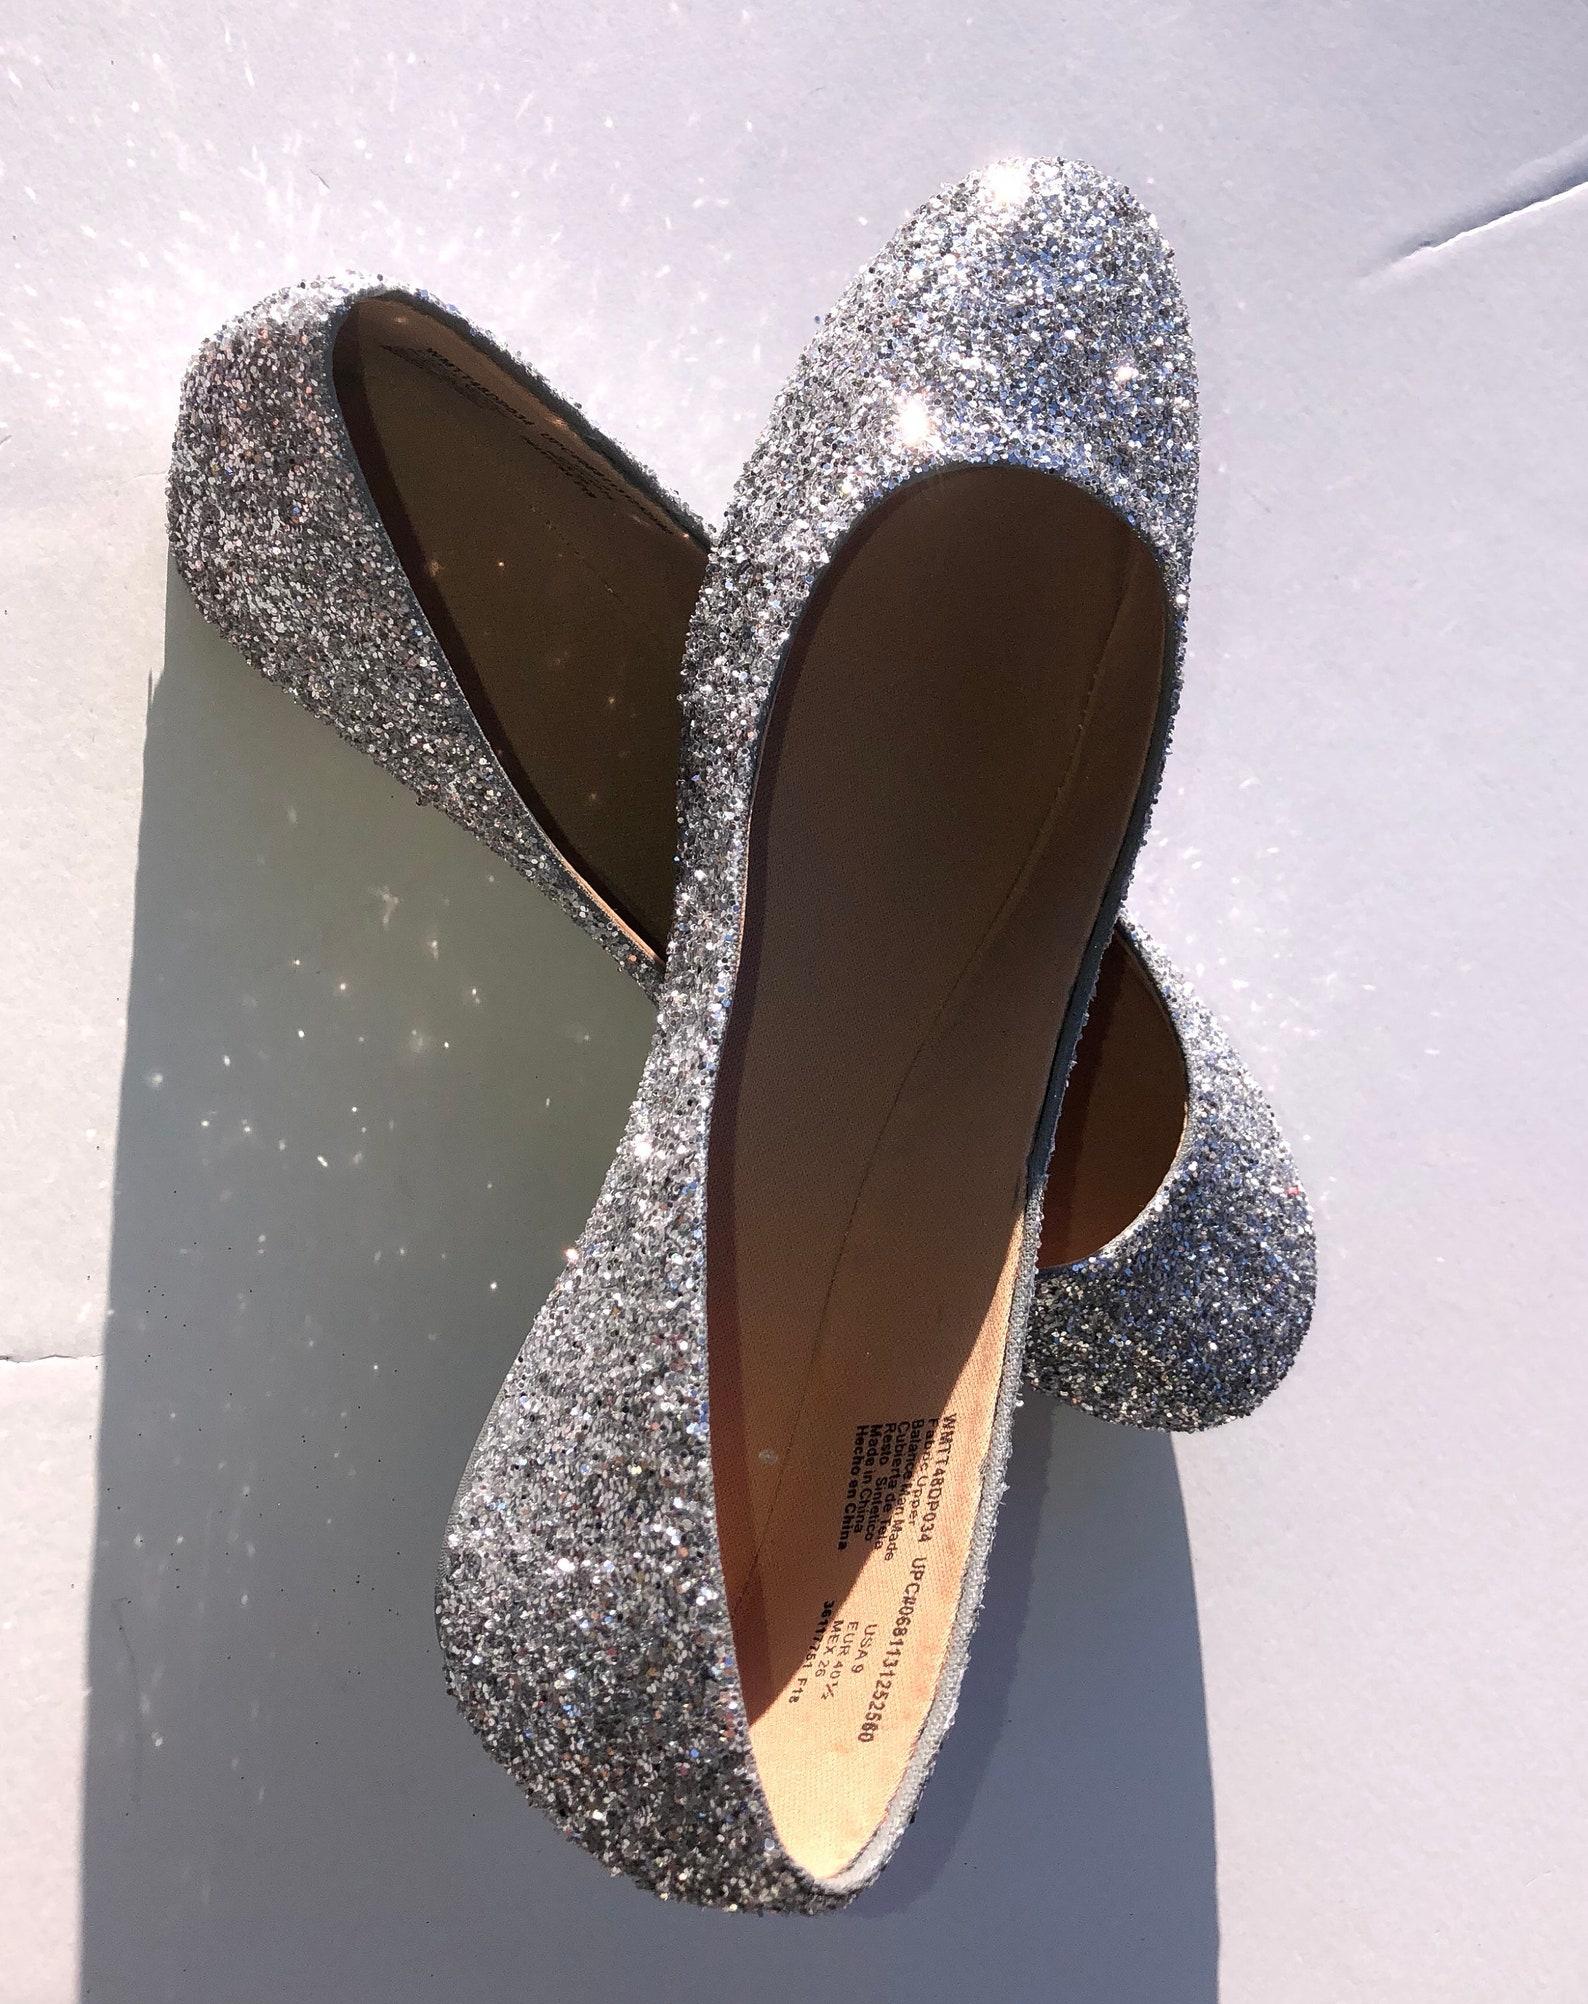 silver flats custom women silver glittered wedding ballet flats w/silver shimmer bottom *free u.s. shipping* jco.customs by kitt